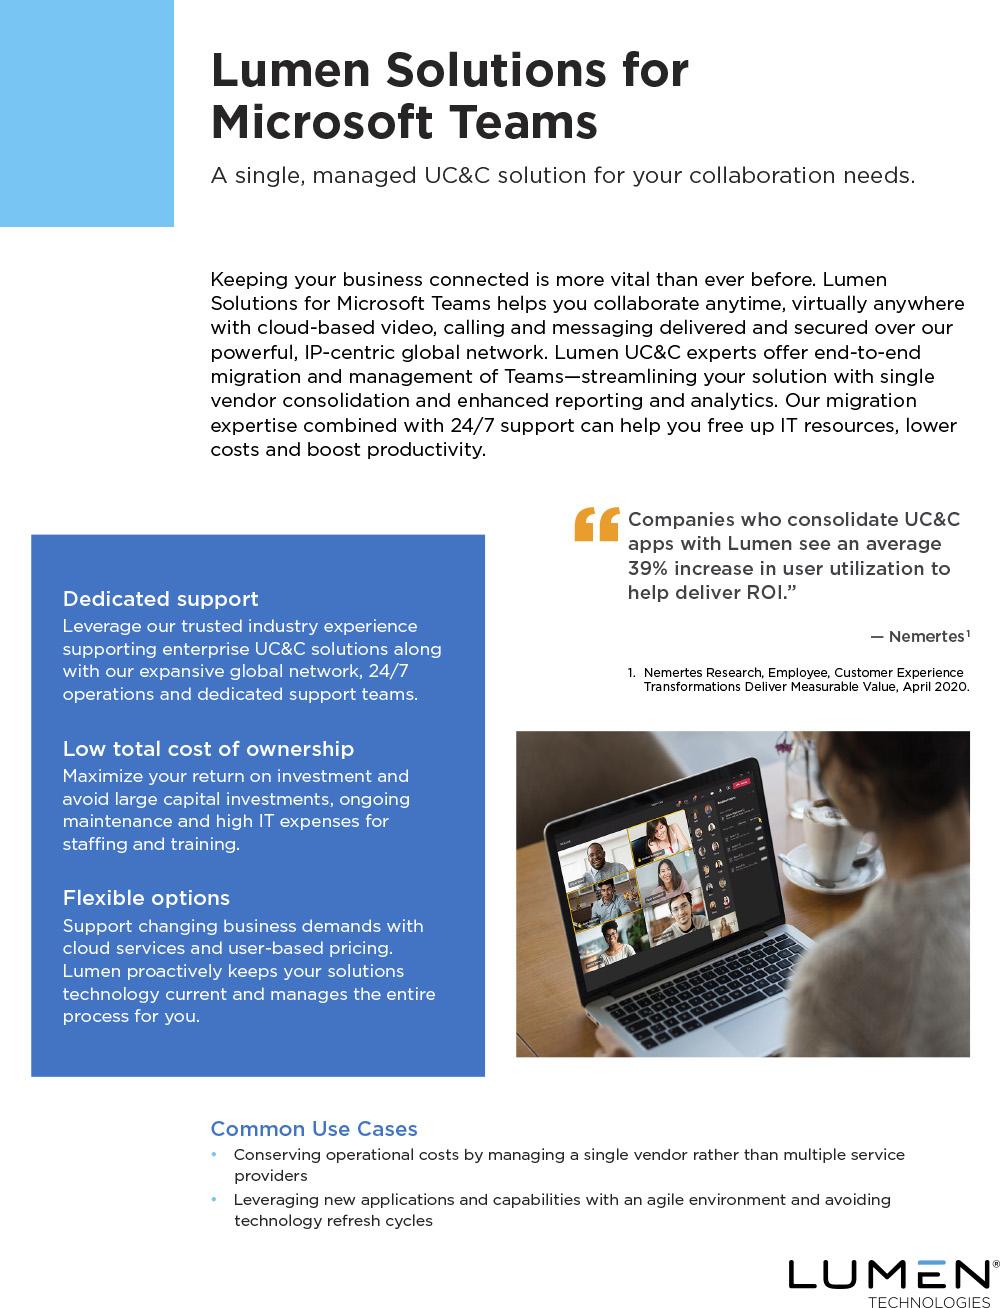 Lumen Solutions for Microsoft Teams Data Sheet